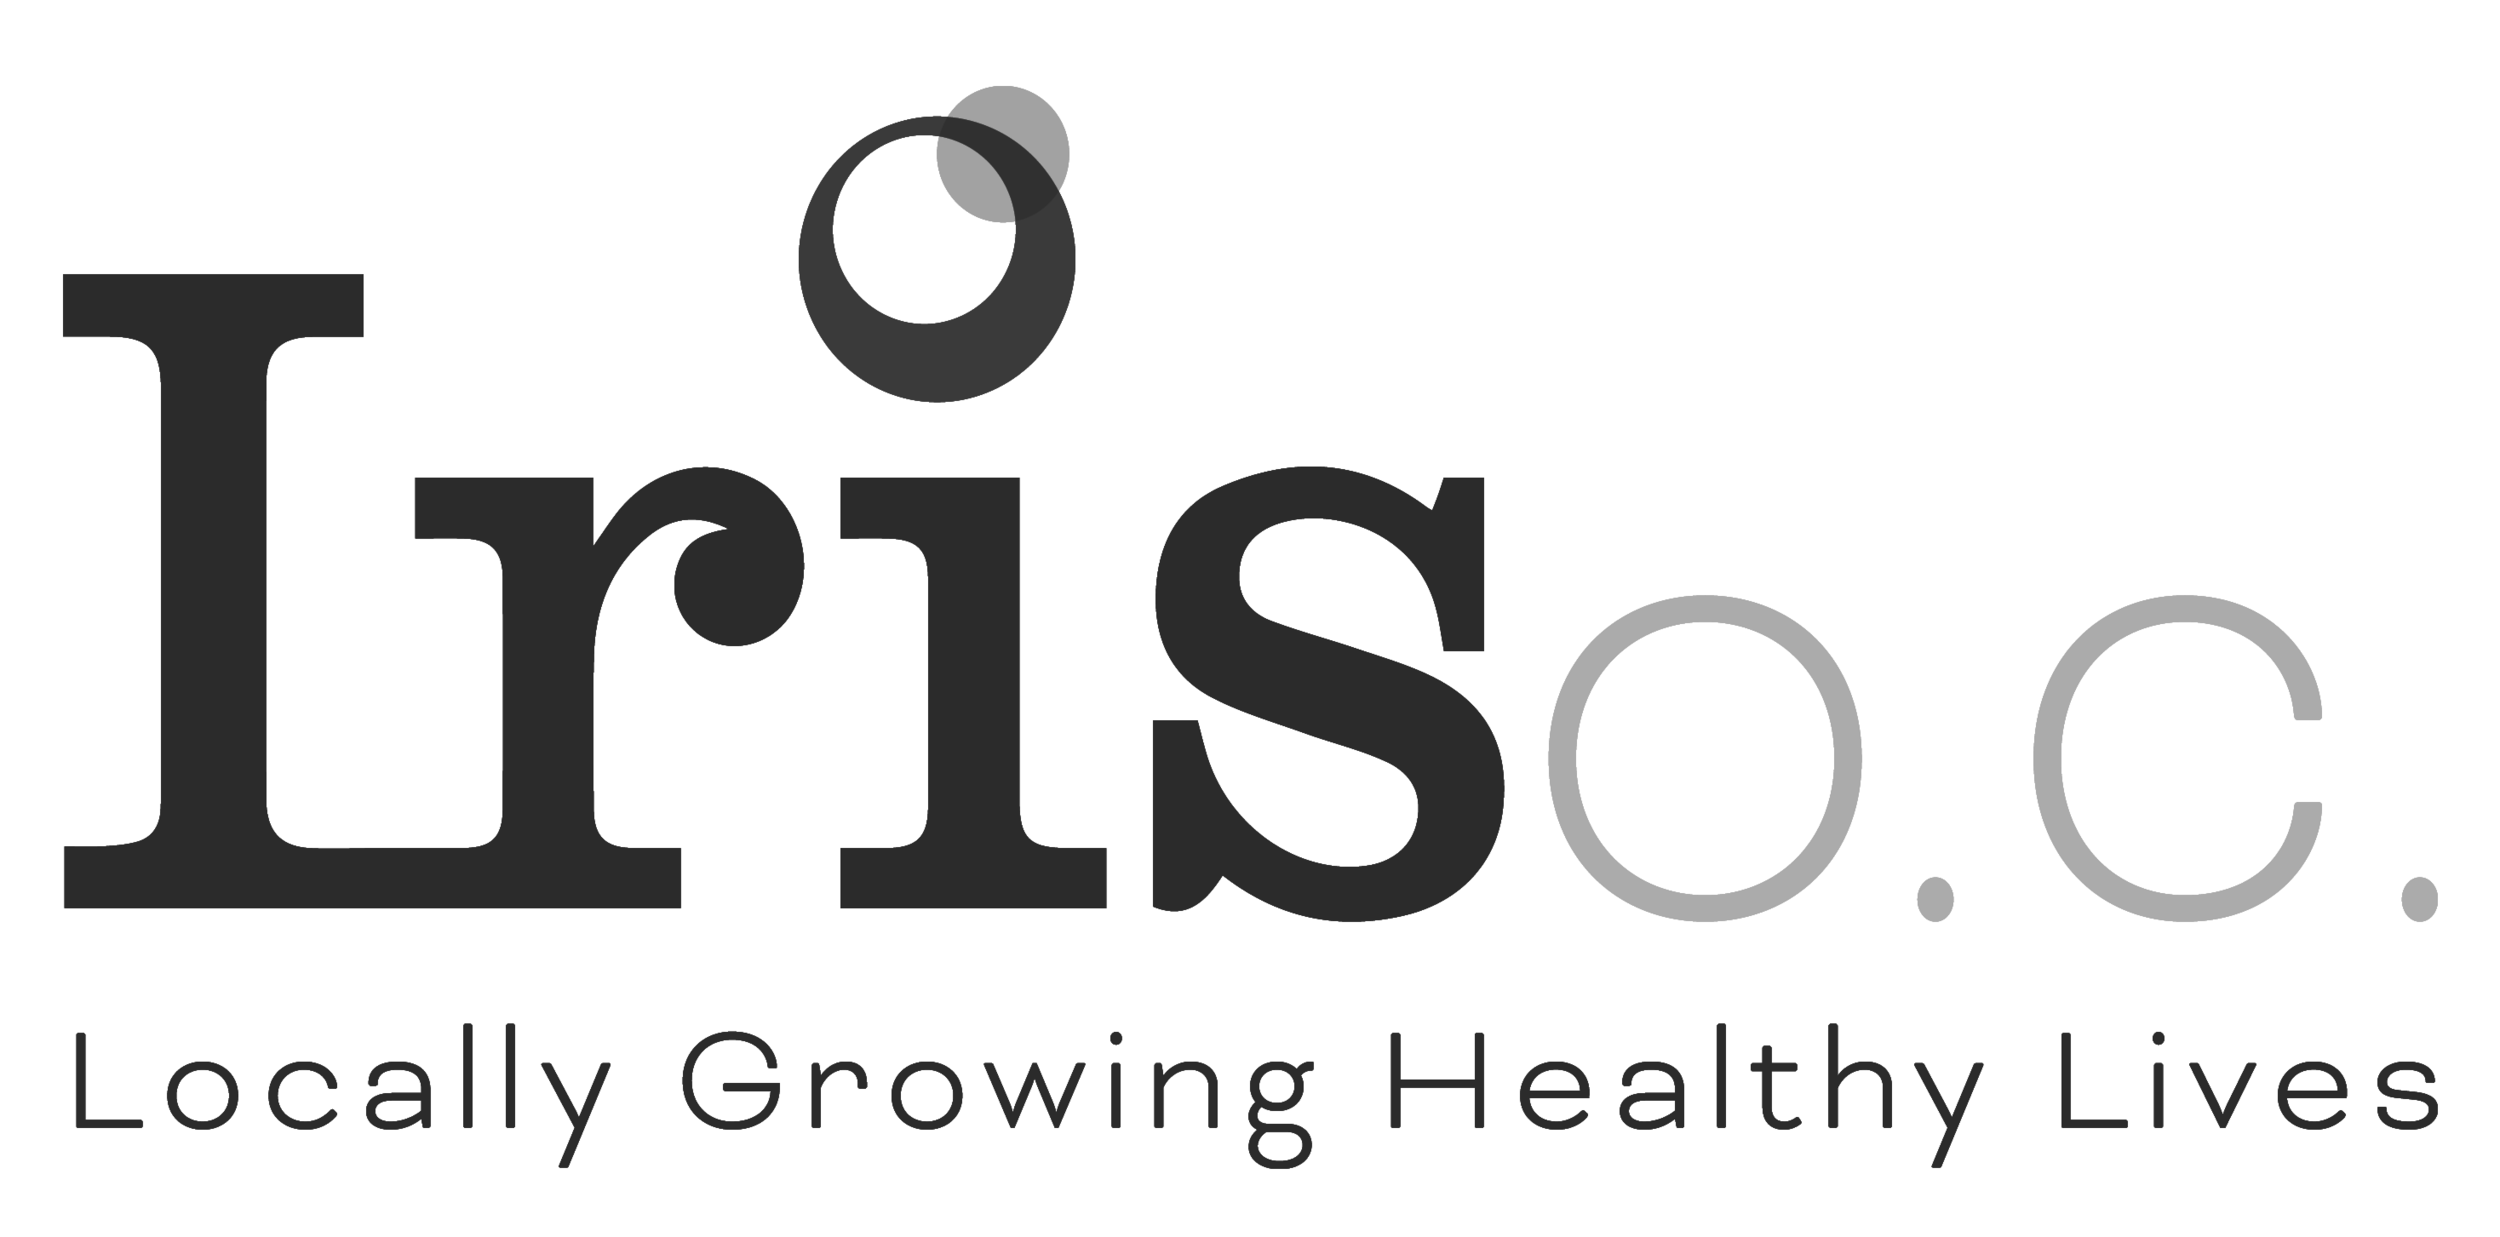 iris-logo-correct-1.png